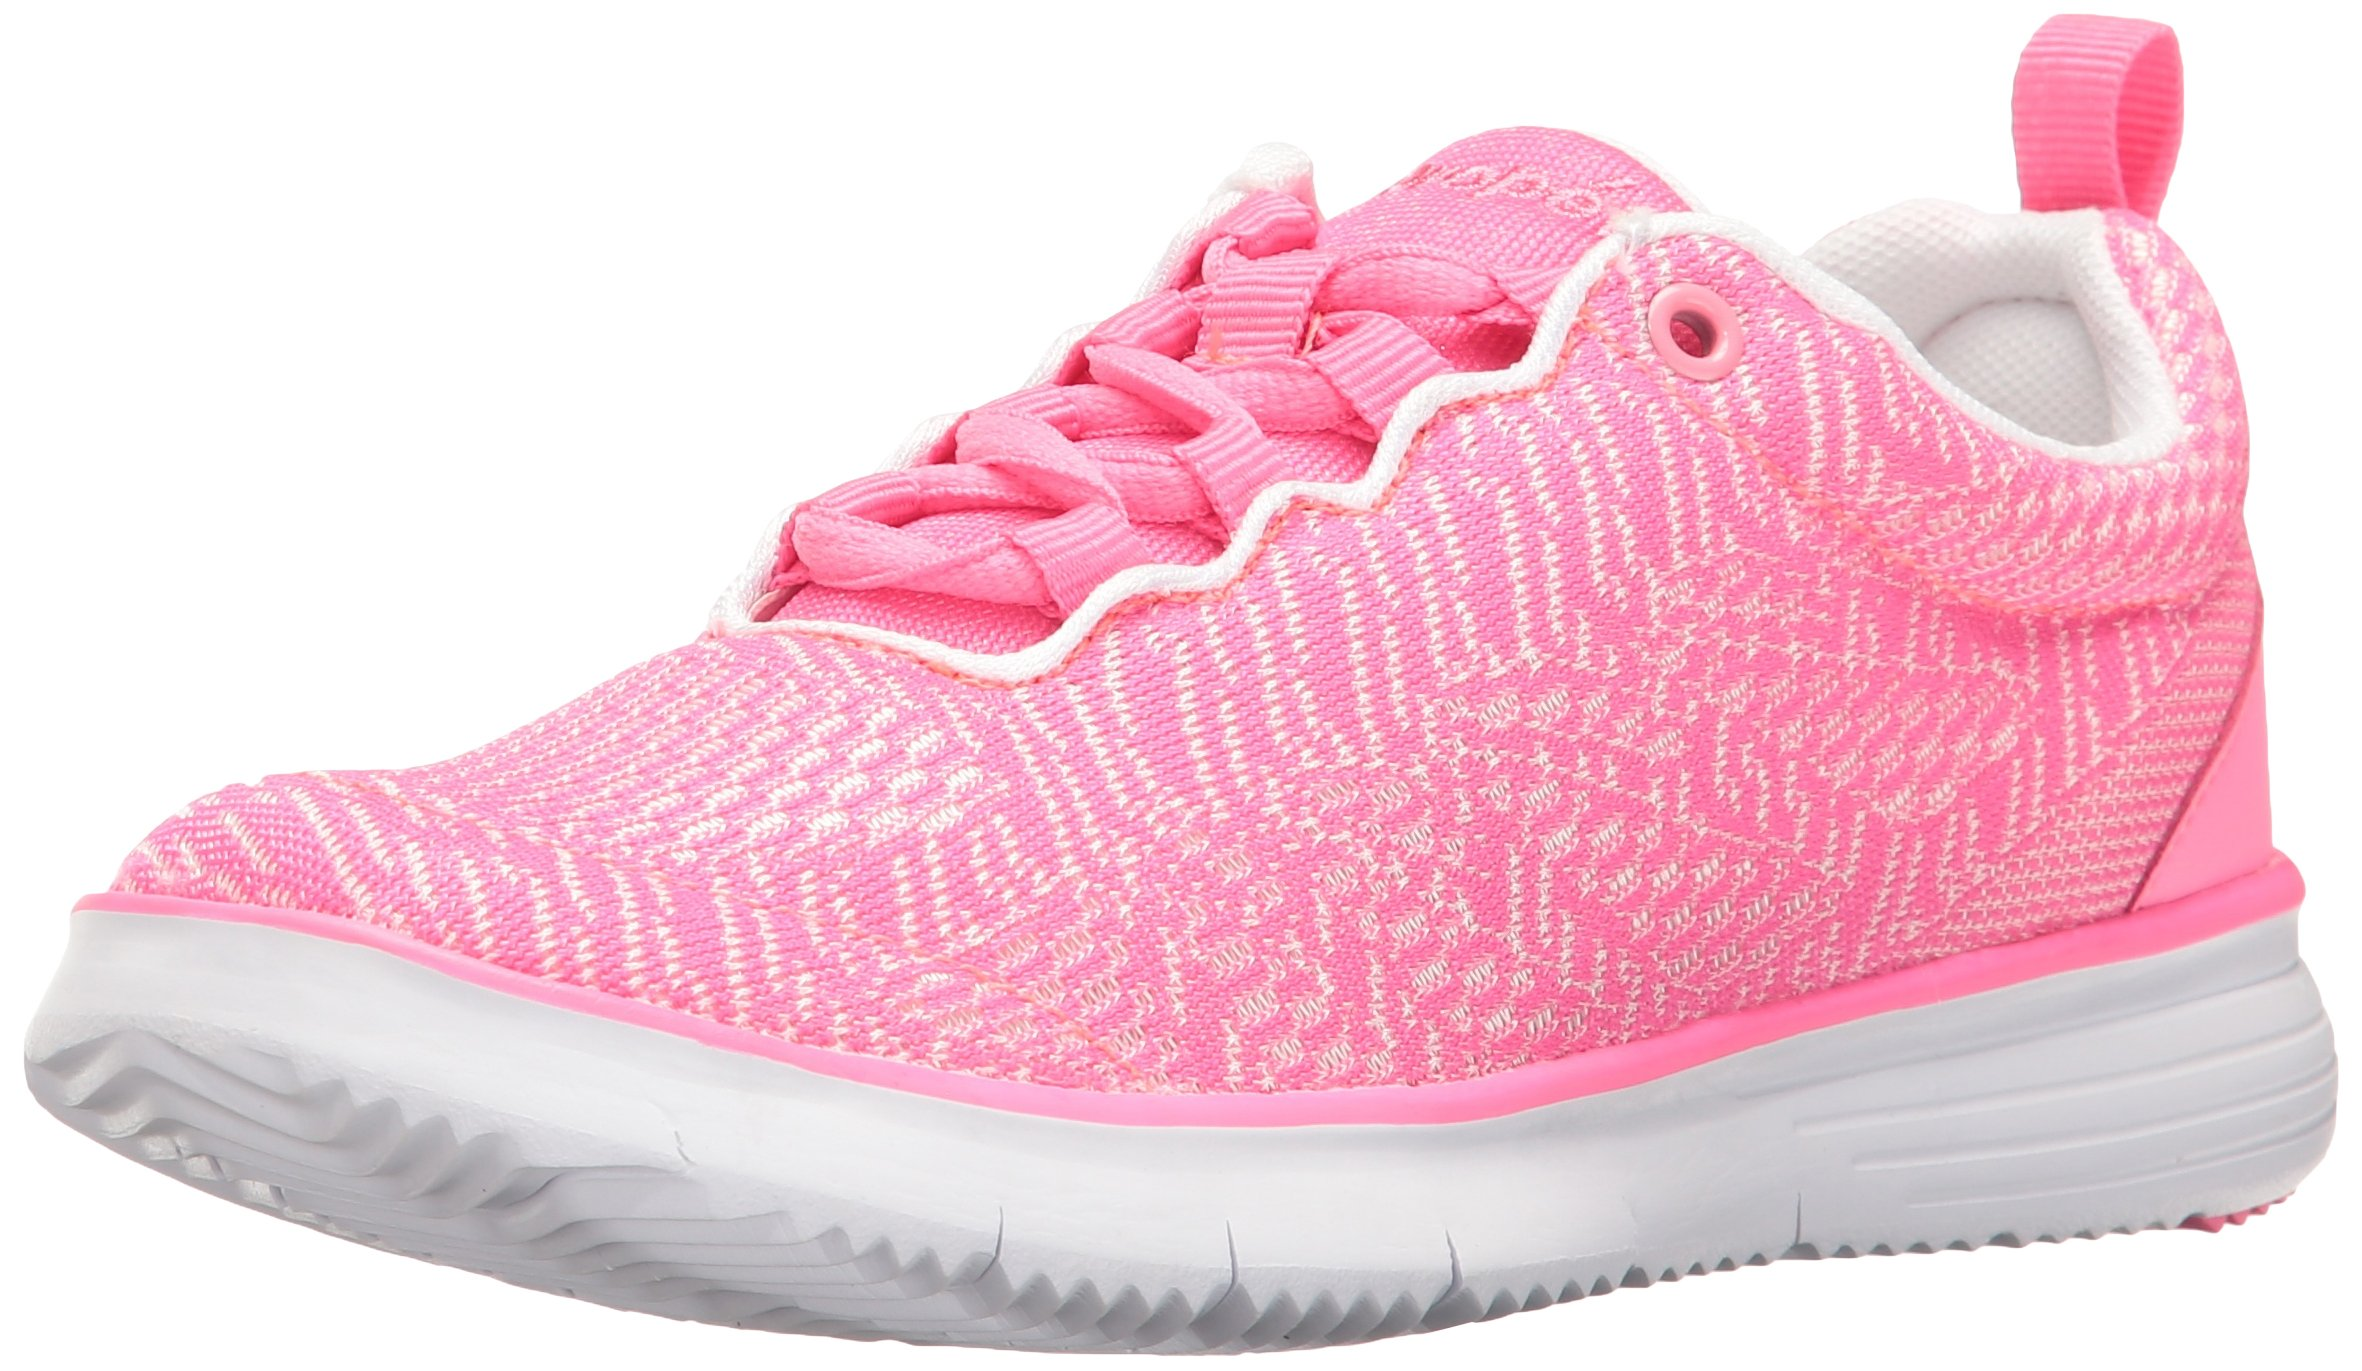 Propet Women's TravelFit Pro Walking Shoe, Pink/White, 7 2E US